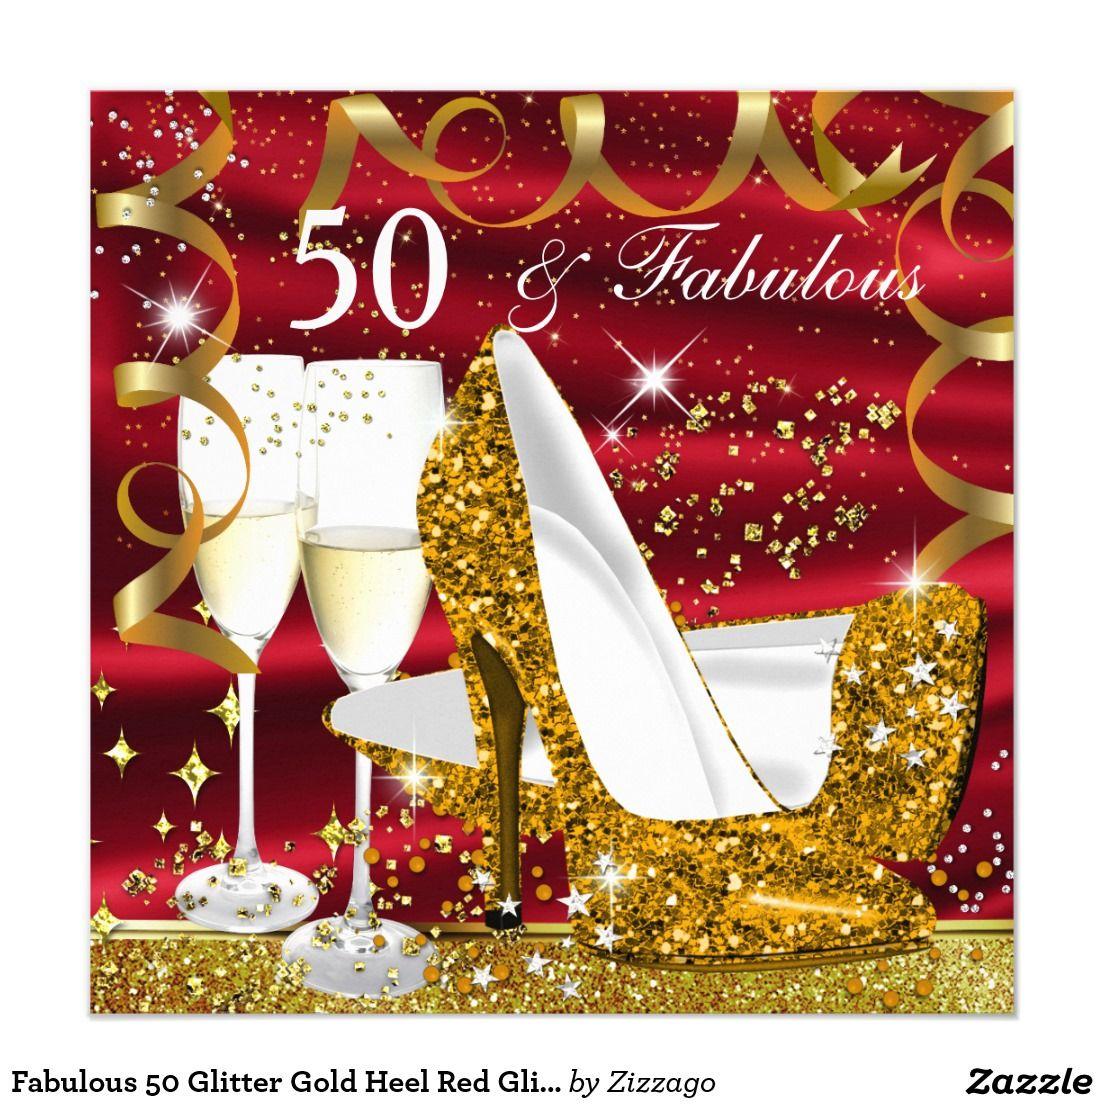 Fabulous 50 Glitter Gold Heel Red Glitz Glam Party Invitation ...